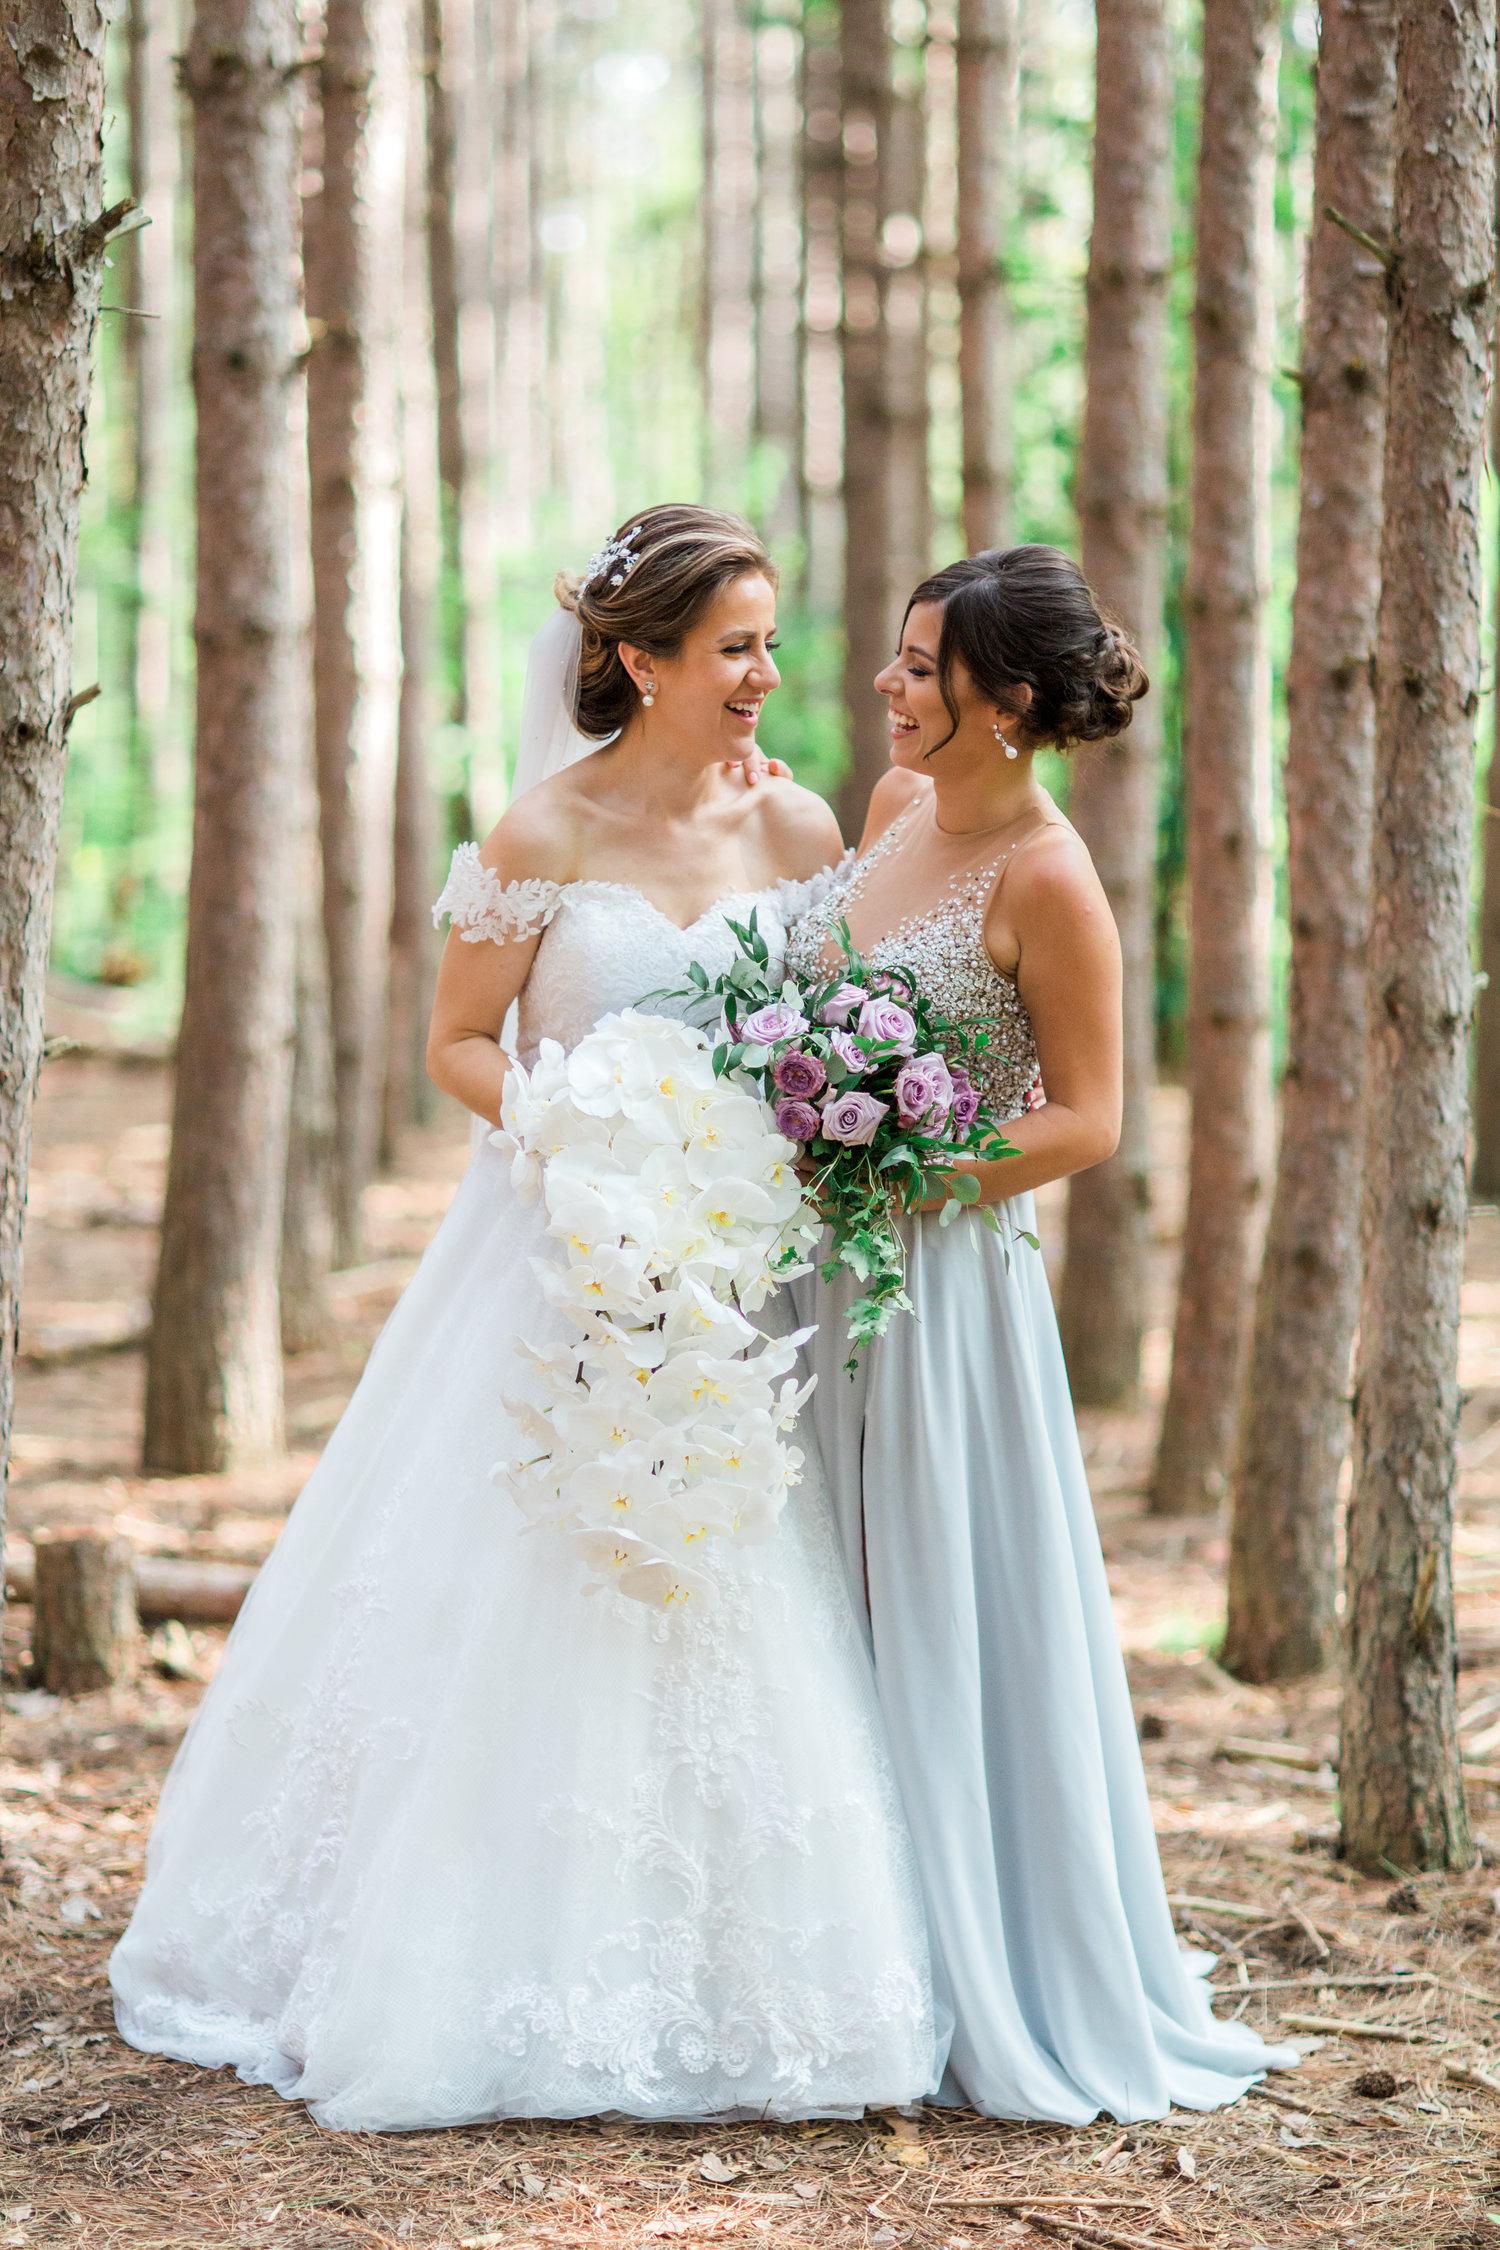 Danielle-Giroux-Amir-Golbazi-Toronto-Wedding-Photographer-Bellvue-Manor_DeLuca_1-668.jpg